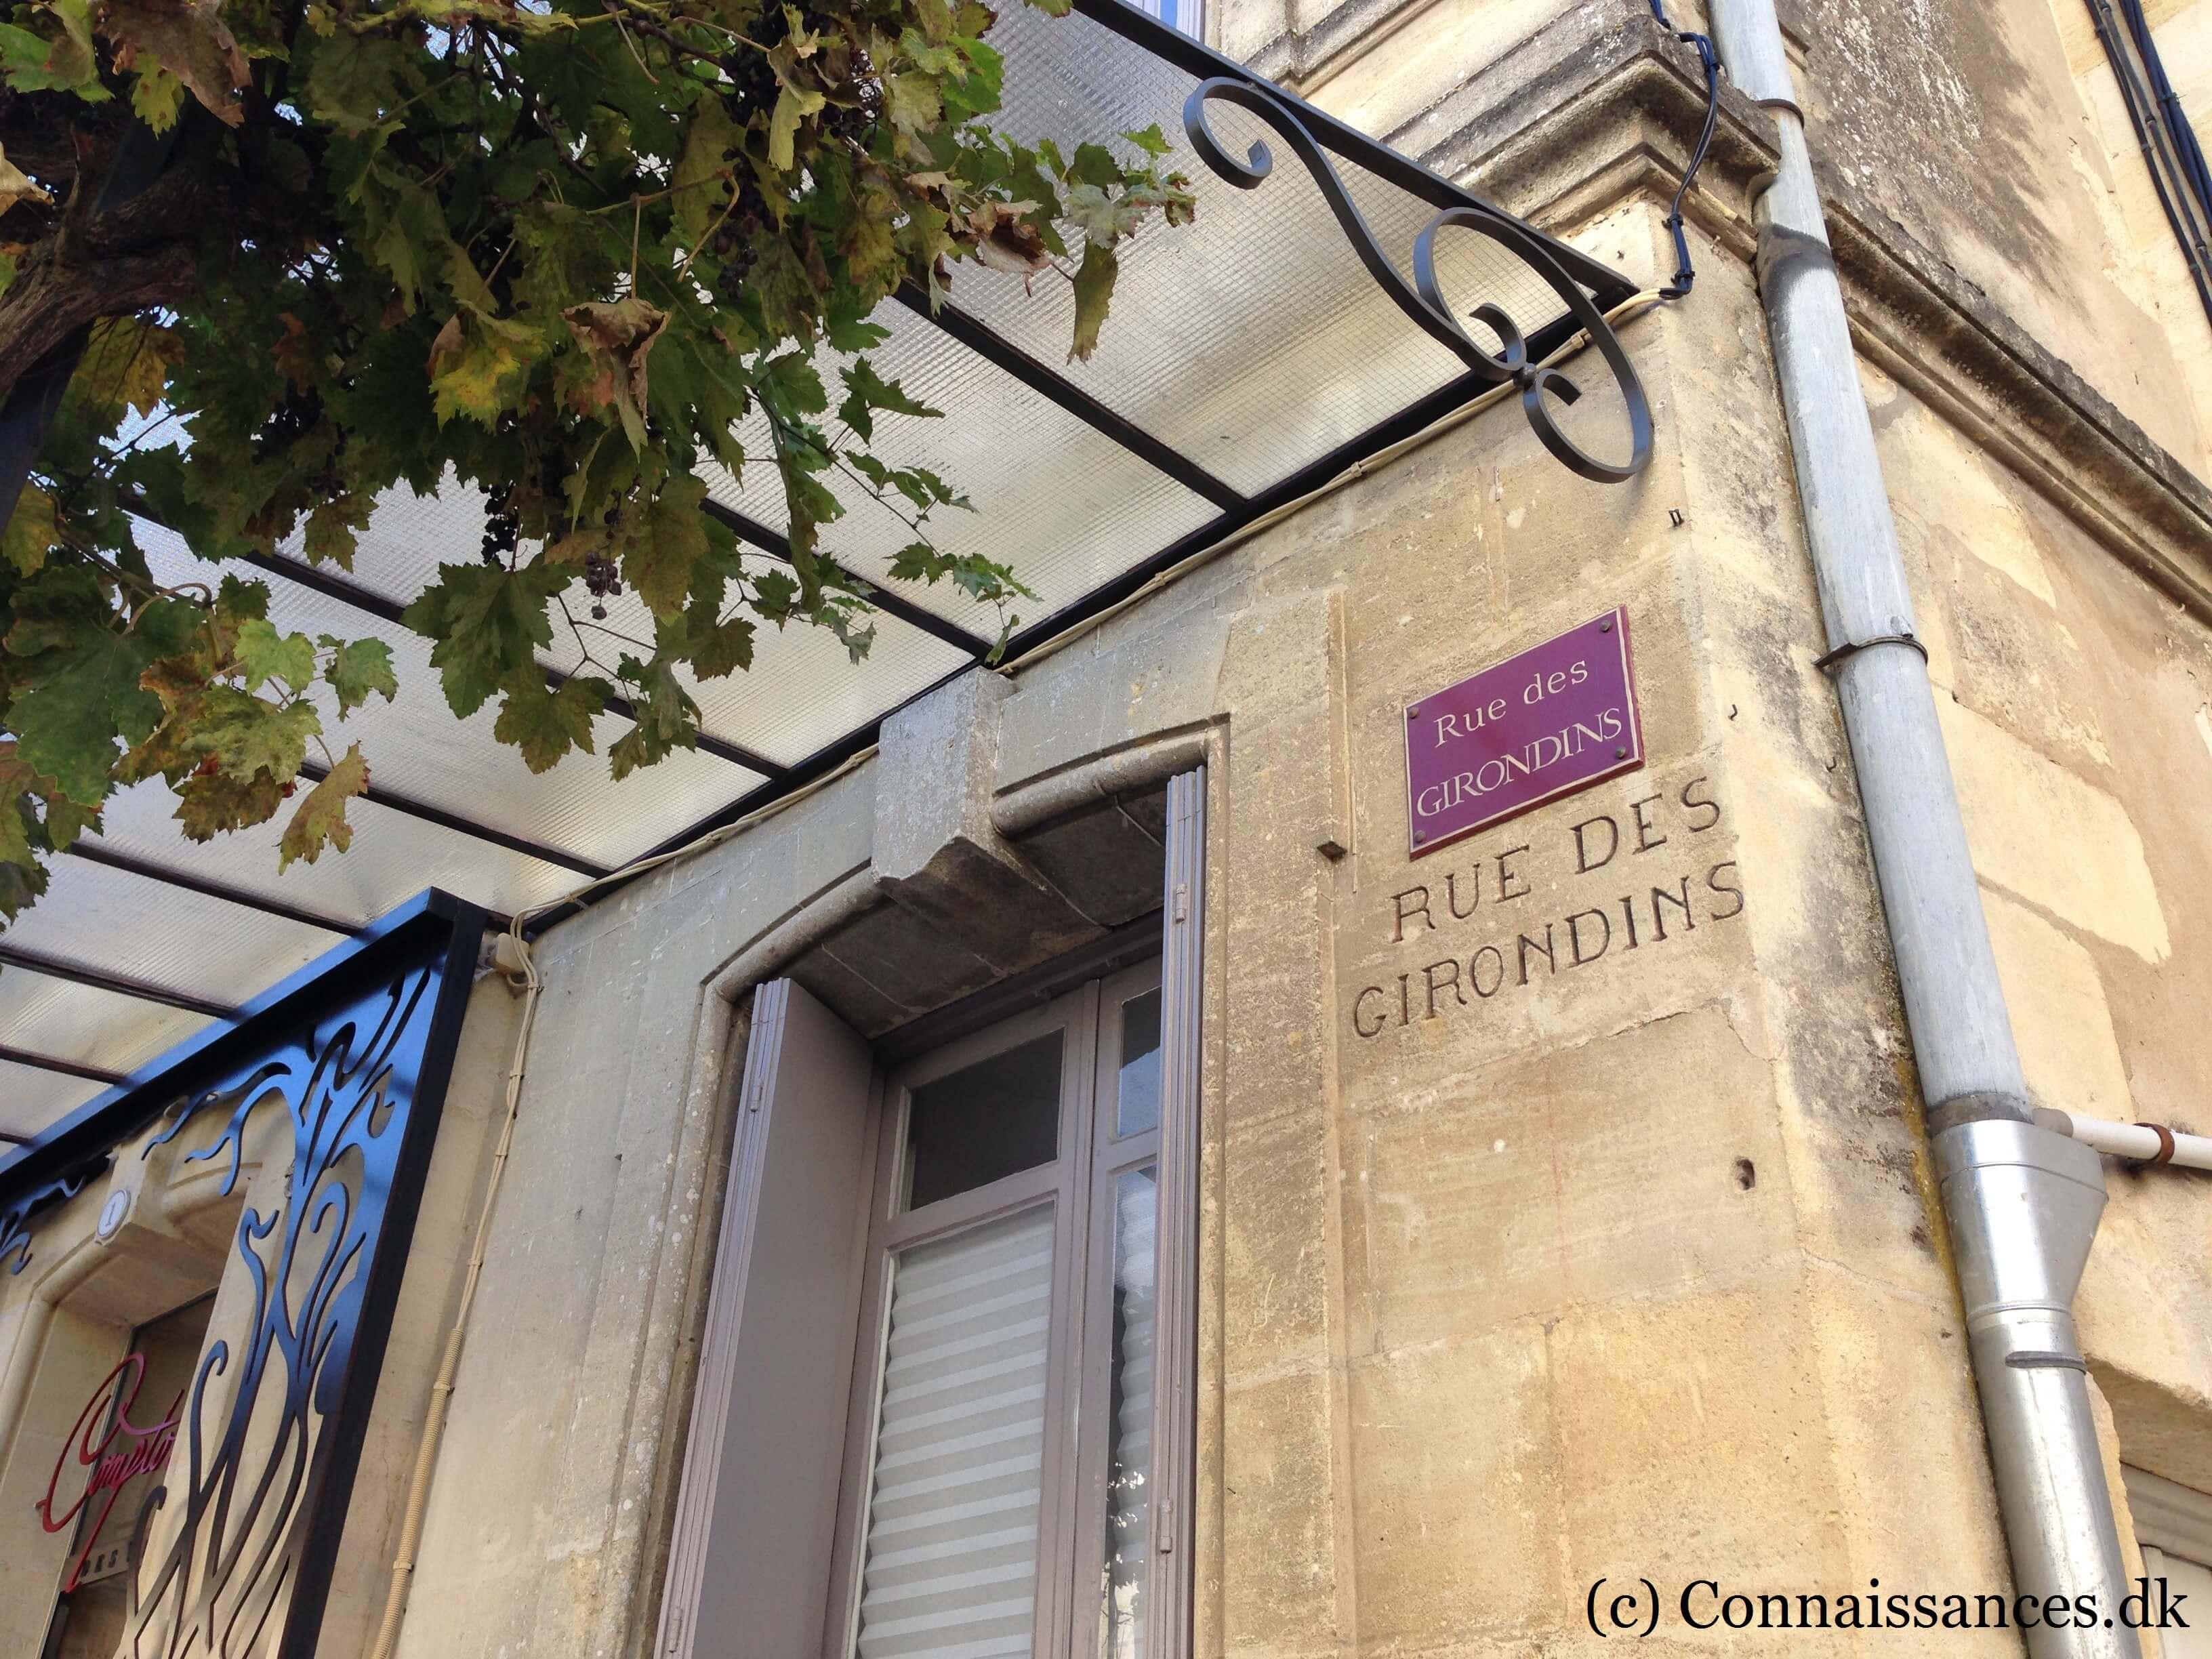 saint-emilion-rue-girondins